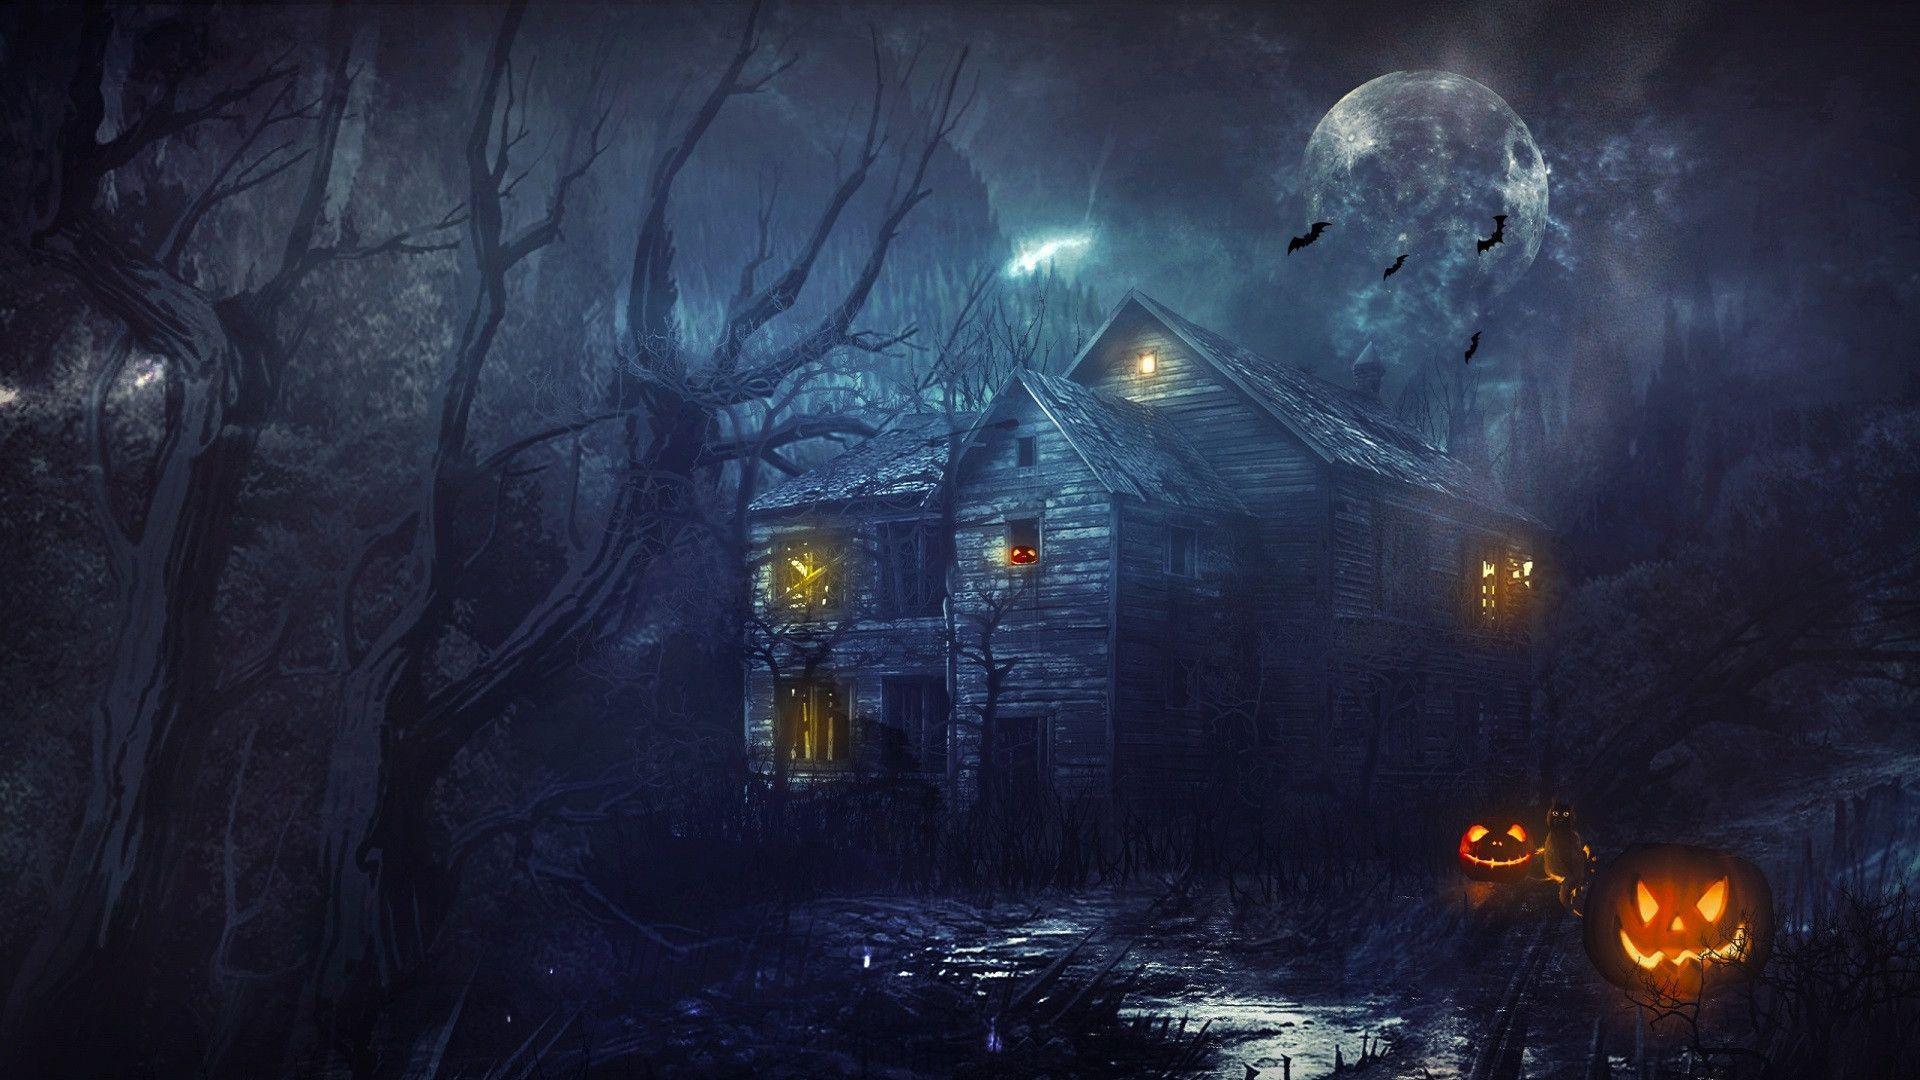 Halloween Backgrounds Wallpapers - Wallpaper Cave